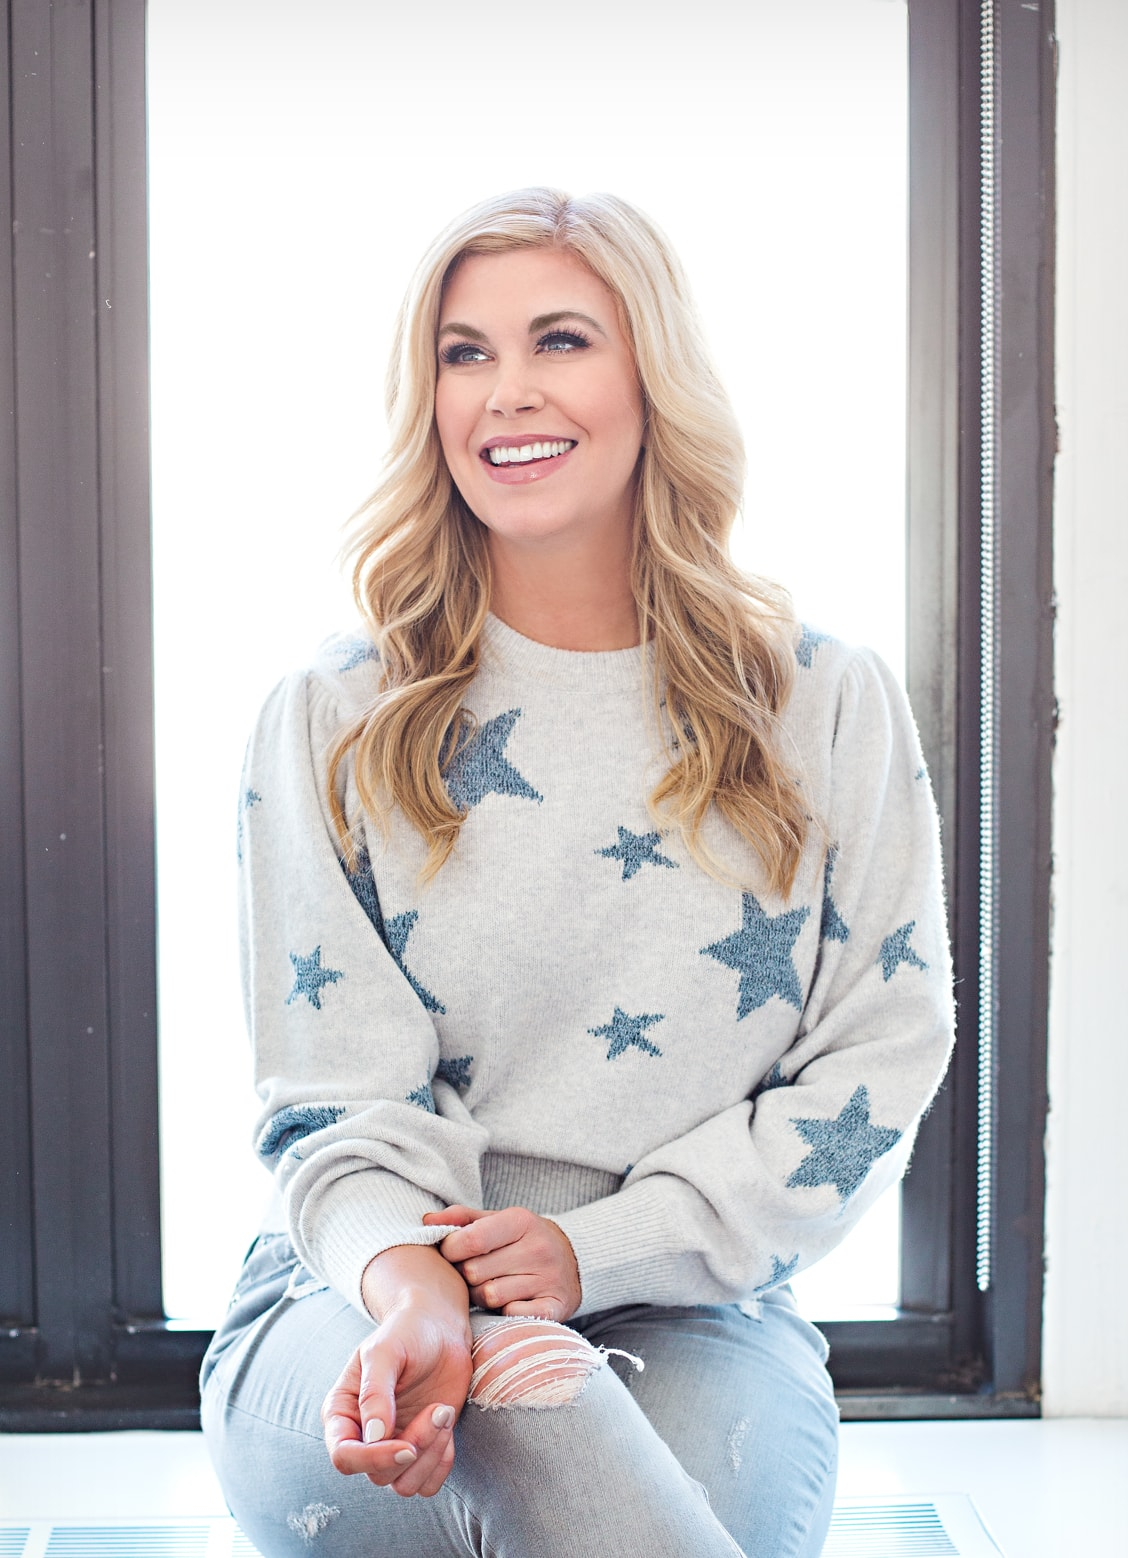 Kate - courses hero image